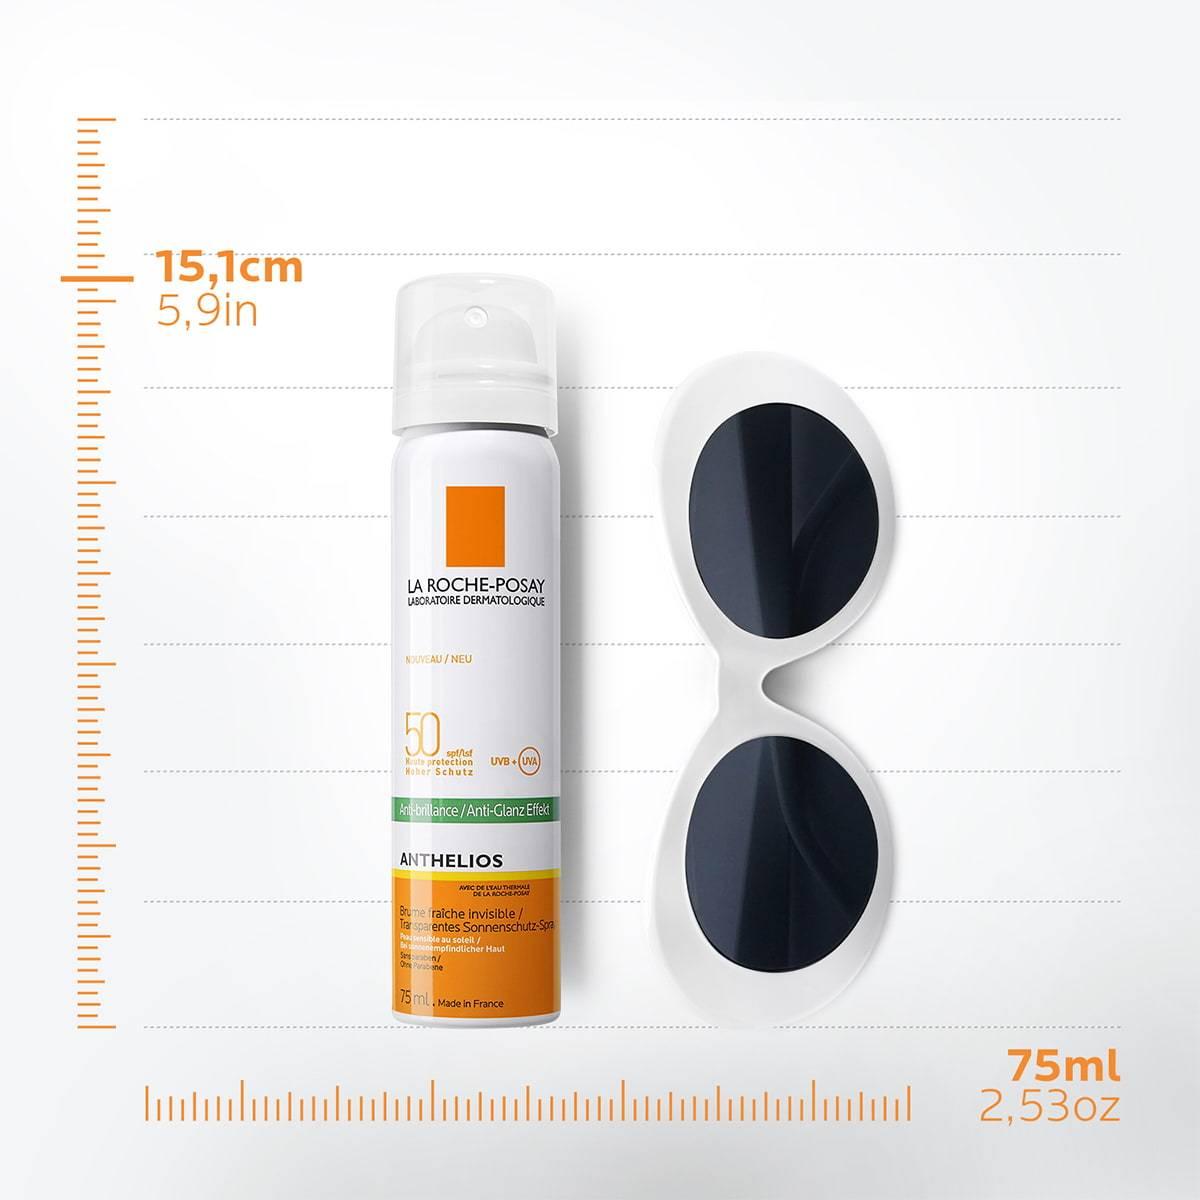 La Roche Posay ProductPage Sun Anthelios Mist Spf50 75ml 3337875549530